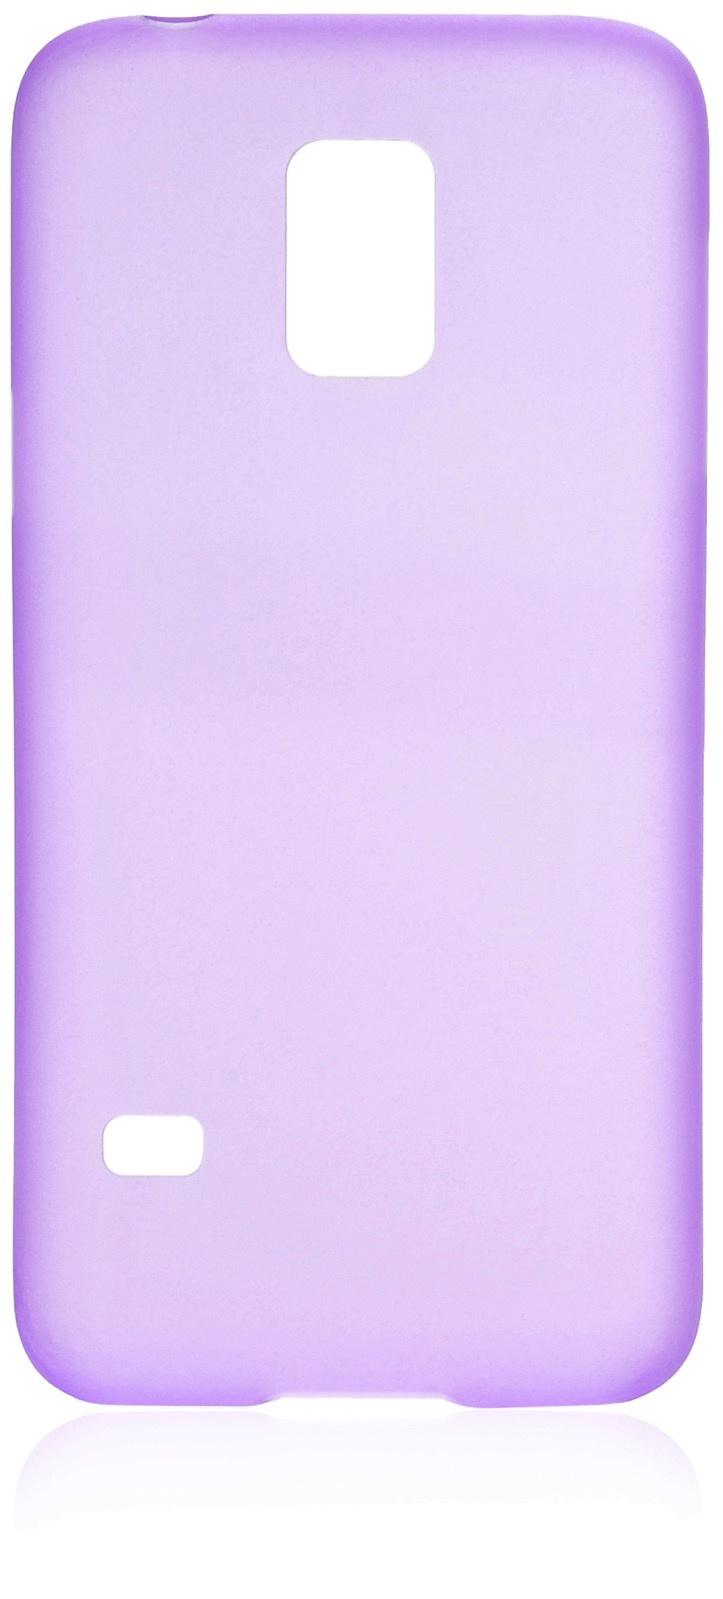 Чехол накладка iNeez пластик 0.3 мм 570007 для Samsung Galaxy S5 mini,570007, фиолетовый